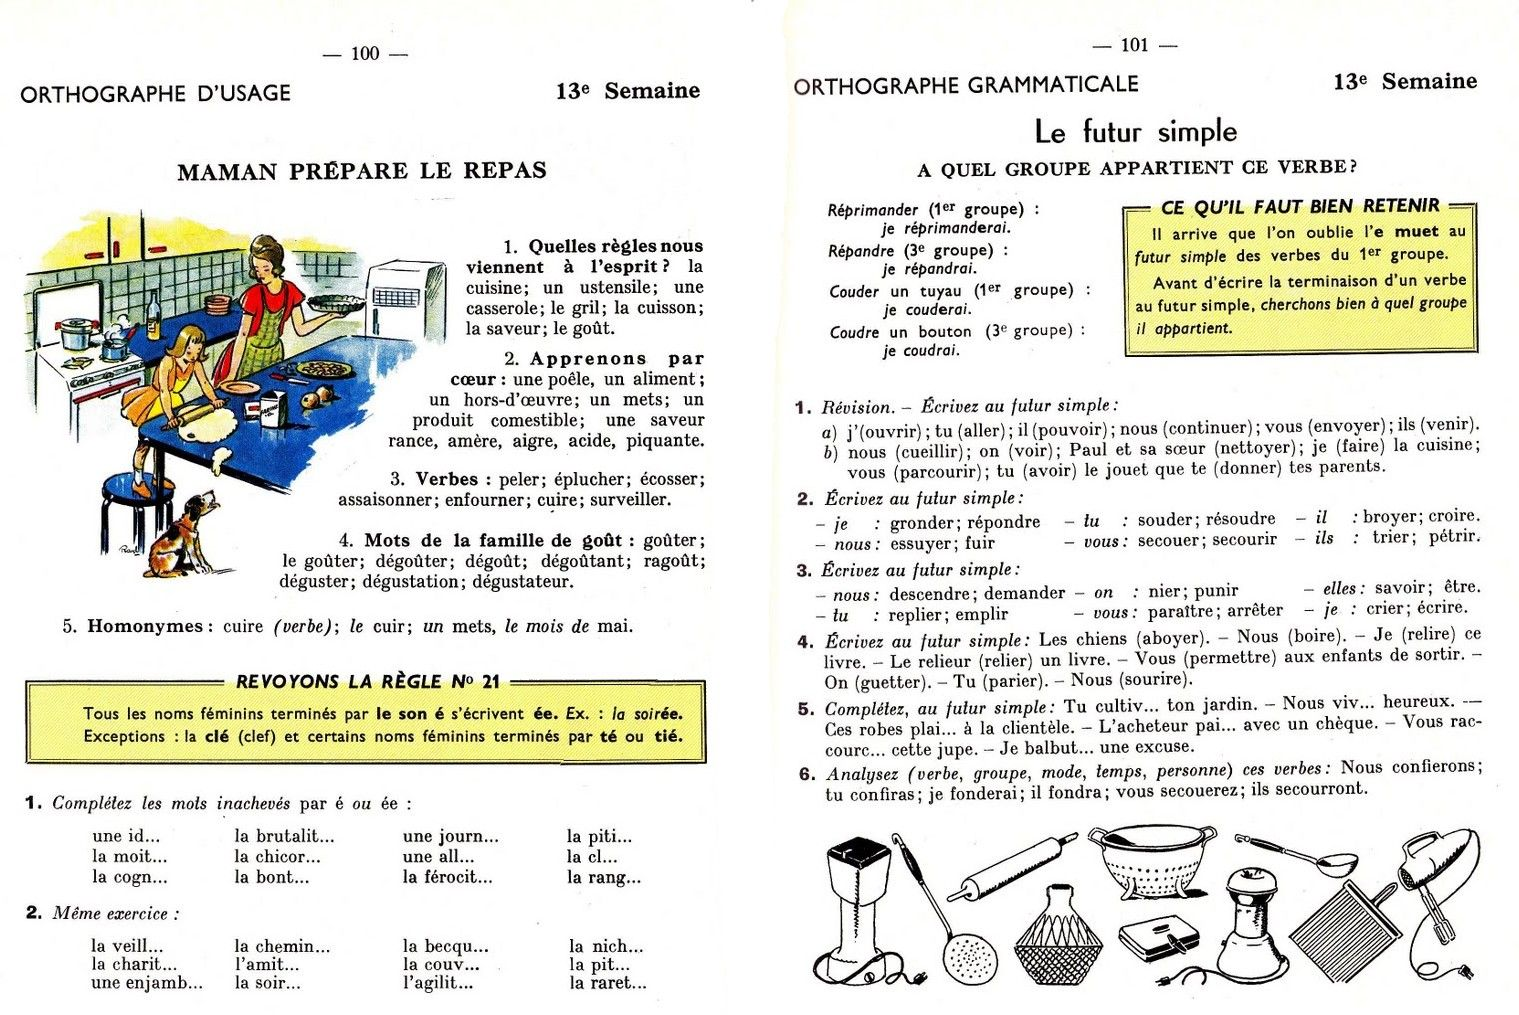 Berthou Grammaire Conjugaison Orthographe Cm1 Boarding Pass